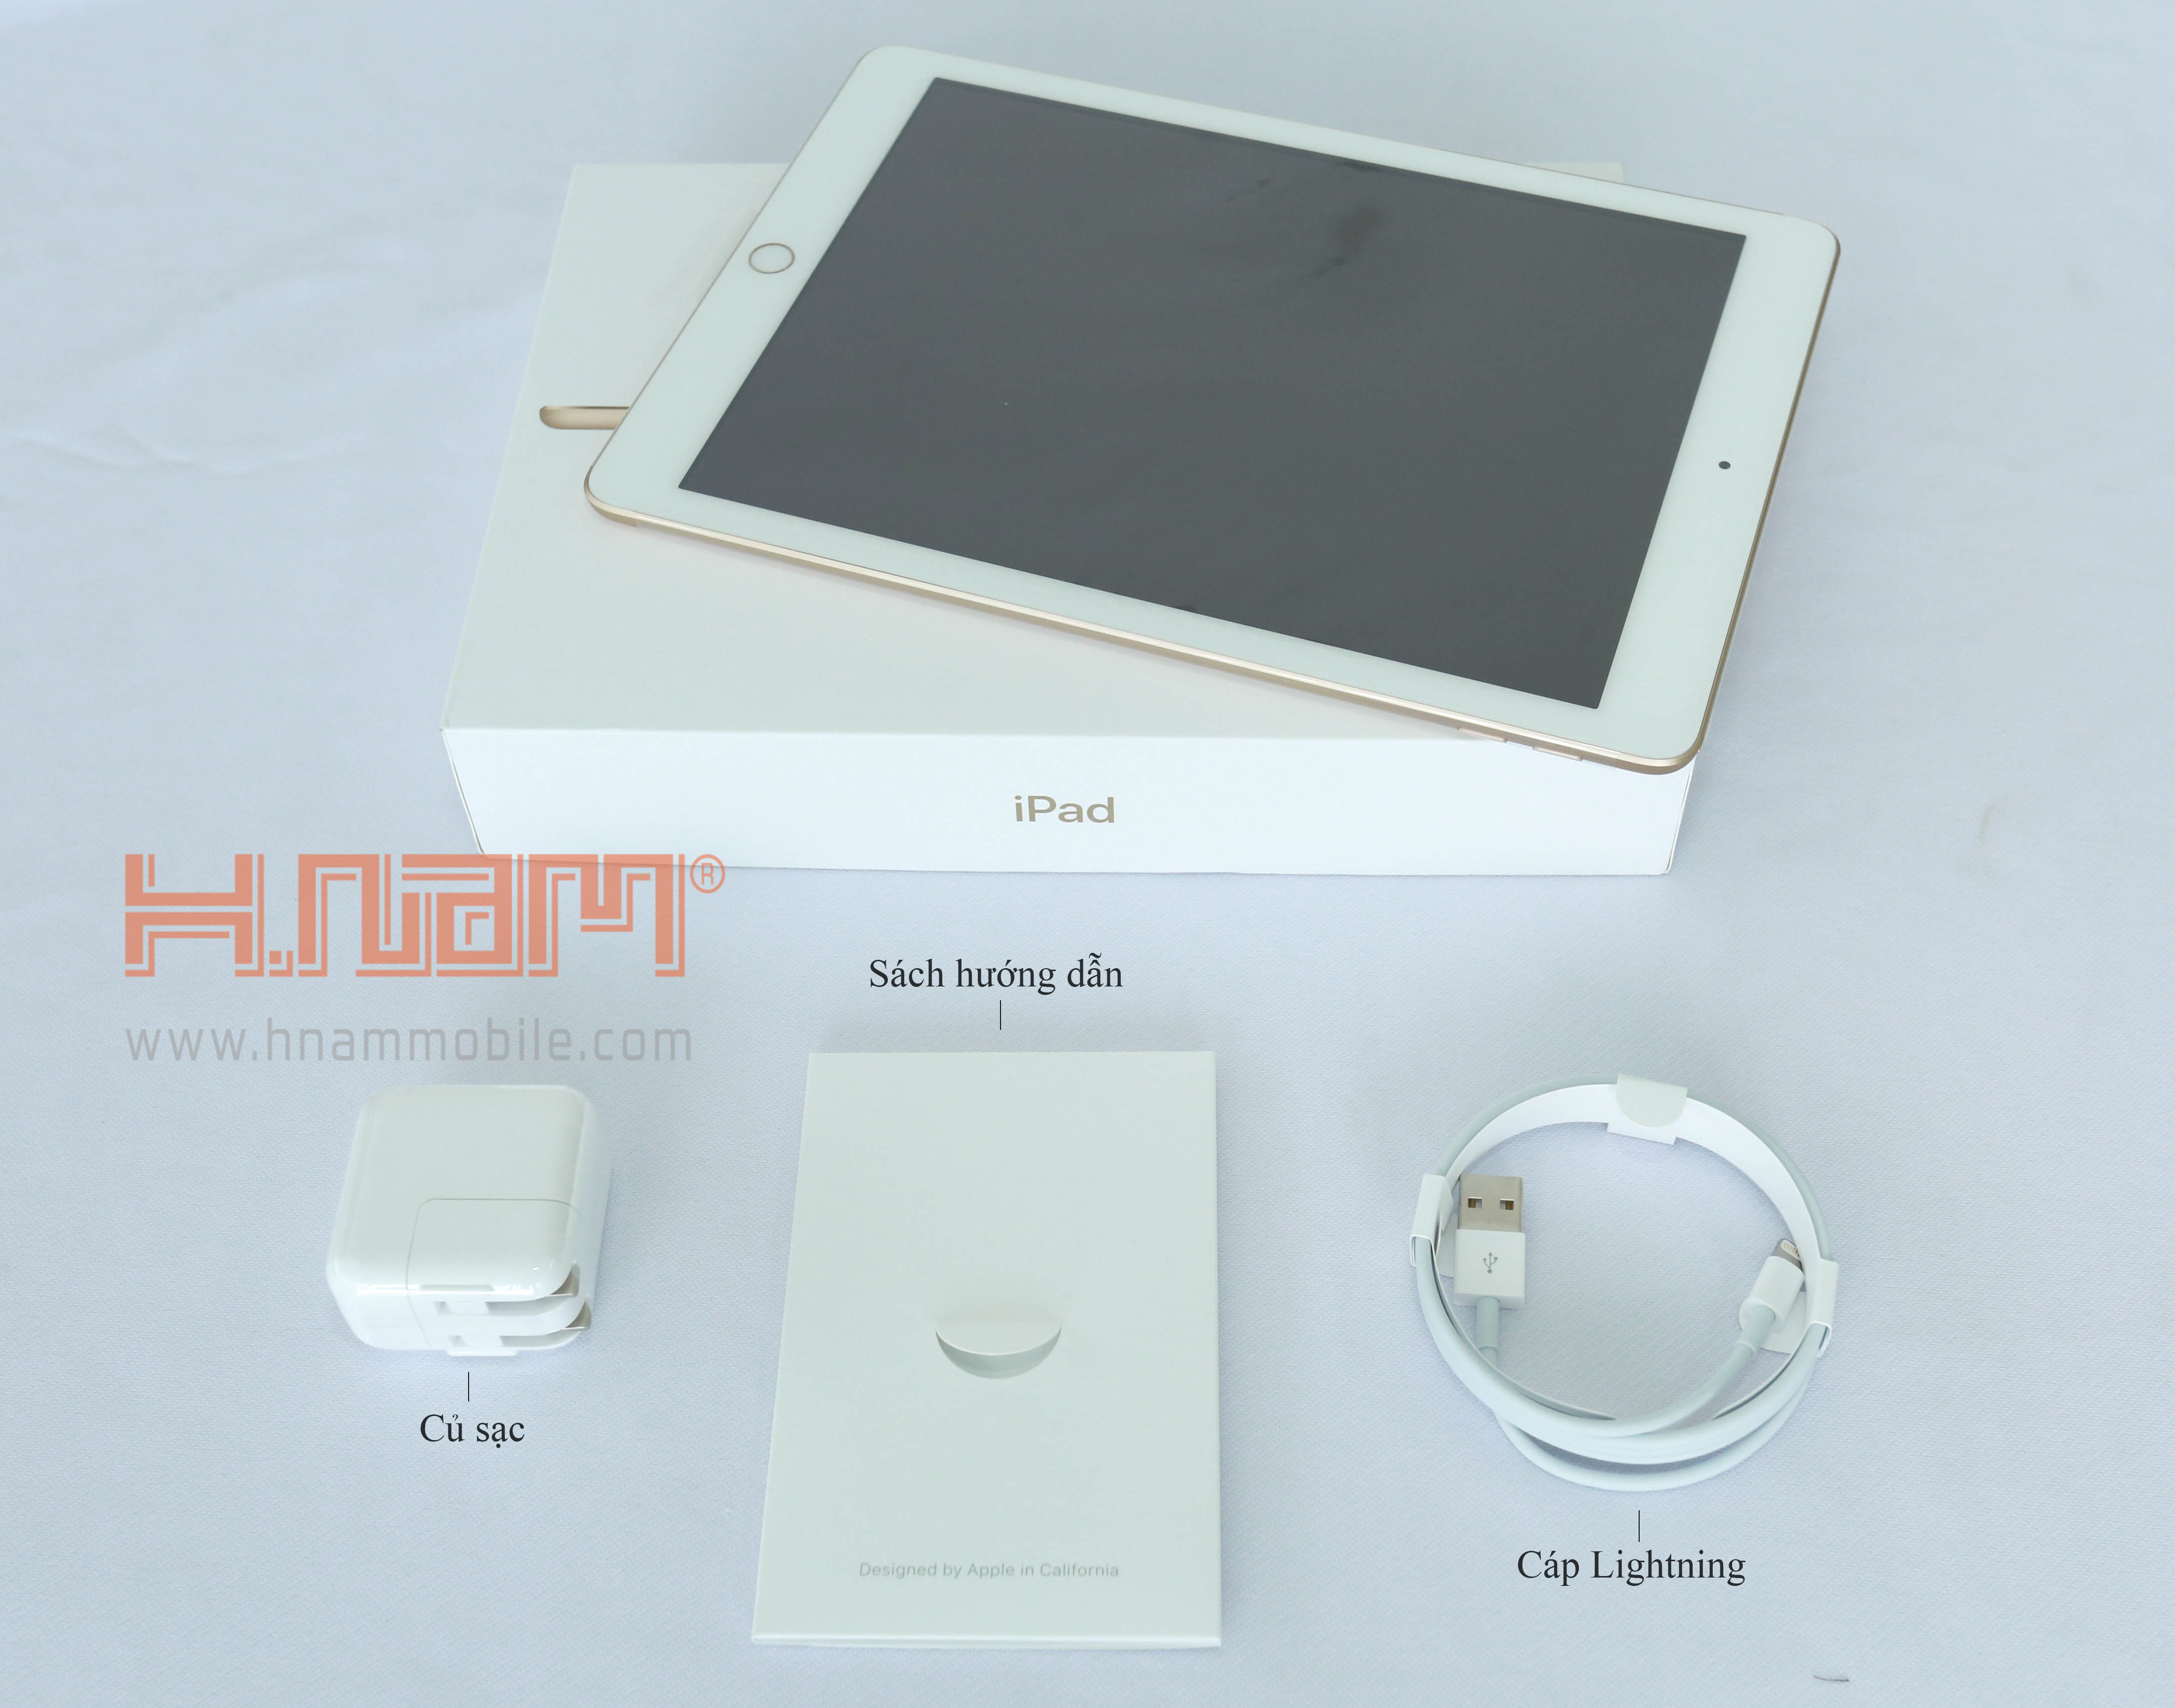 Apple iPad Gen 6 (2018) Wifi 128Gb hình sản phẩm 0